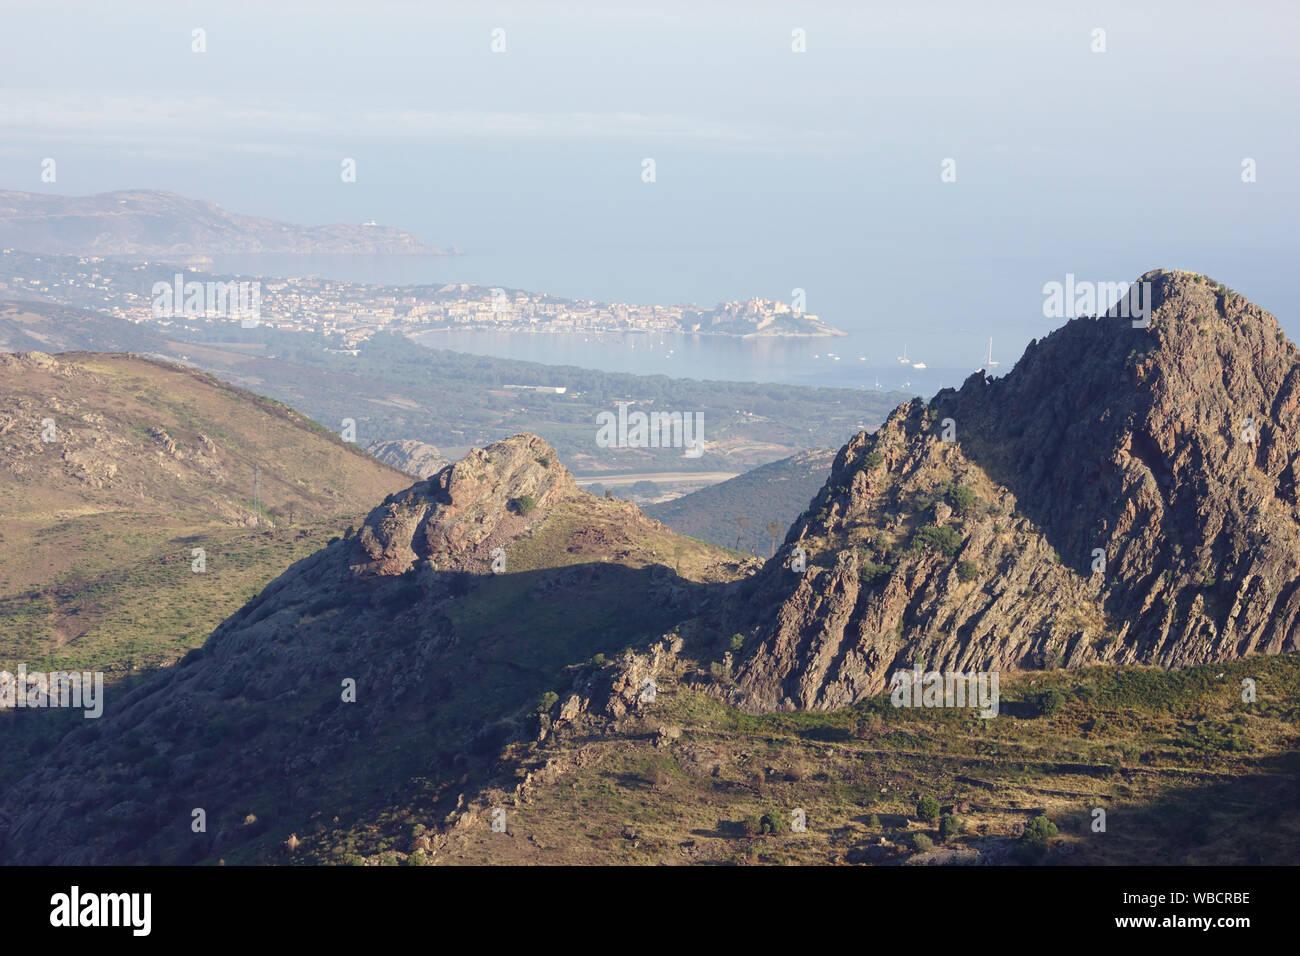 View back to Calvi and the Mediterranean, ascent to Bocca a U Saltu, near Calenzana, France, Corsica, GR20 Stock Photo